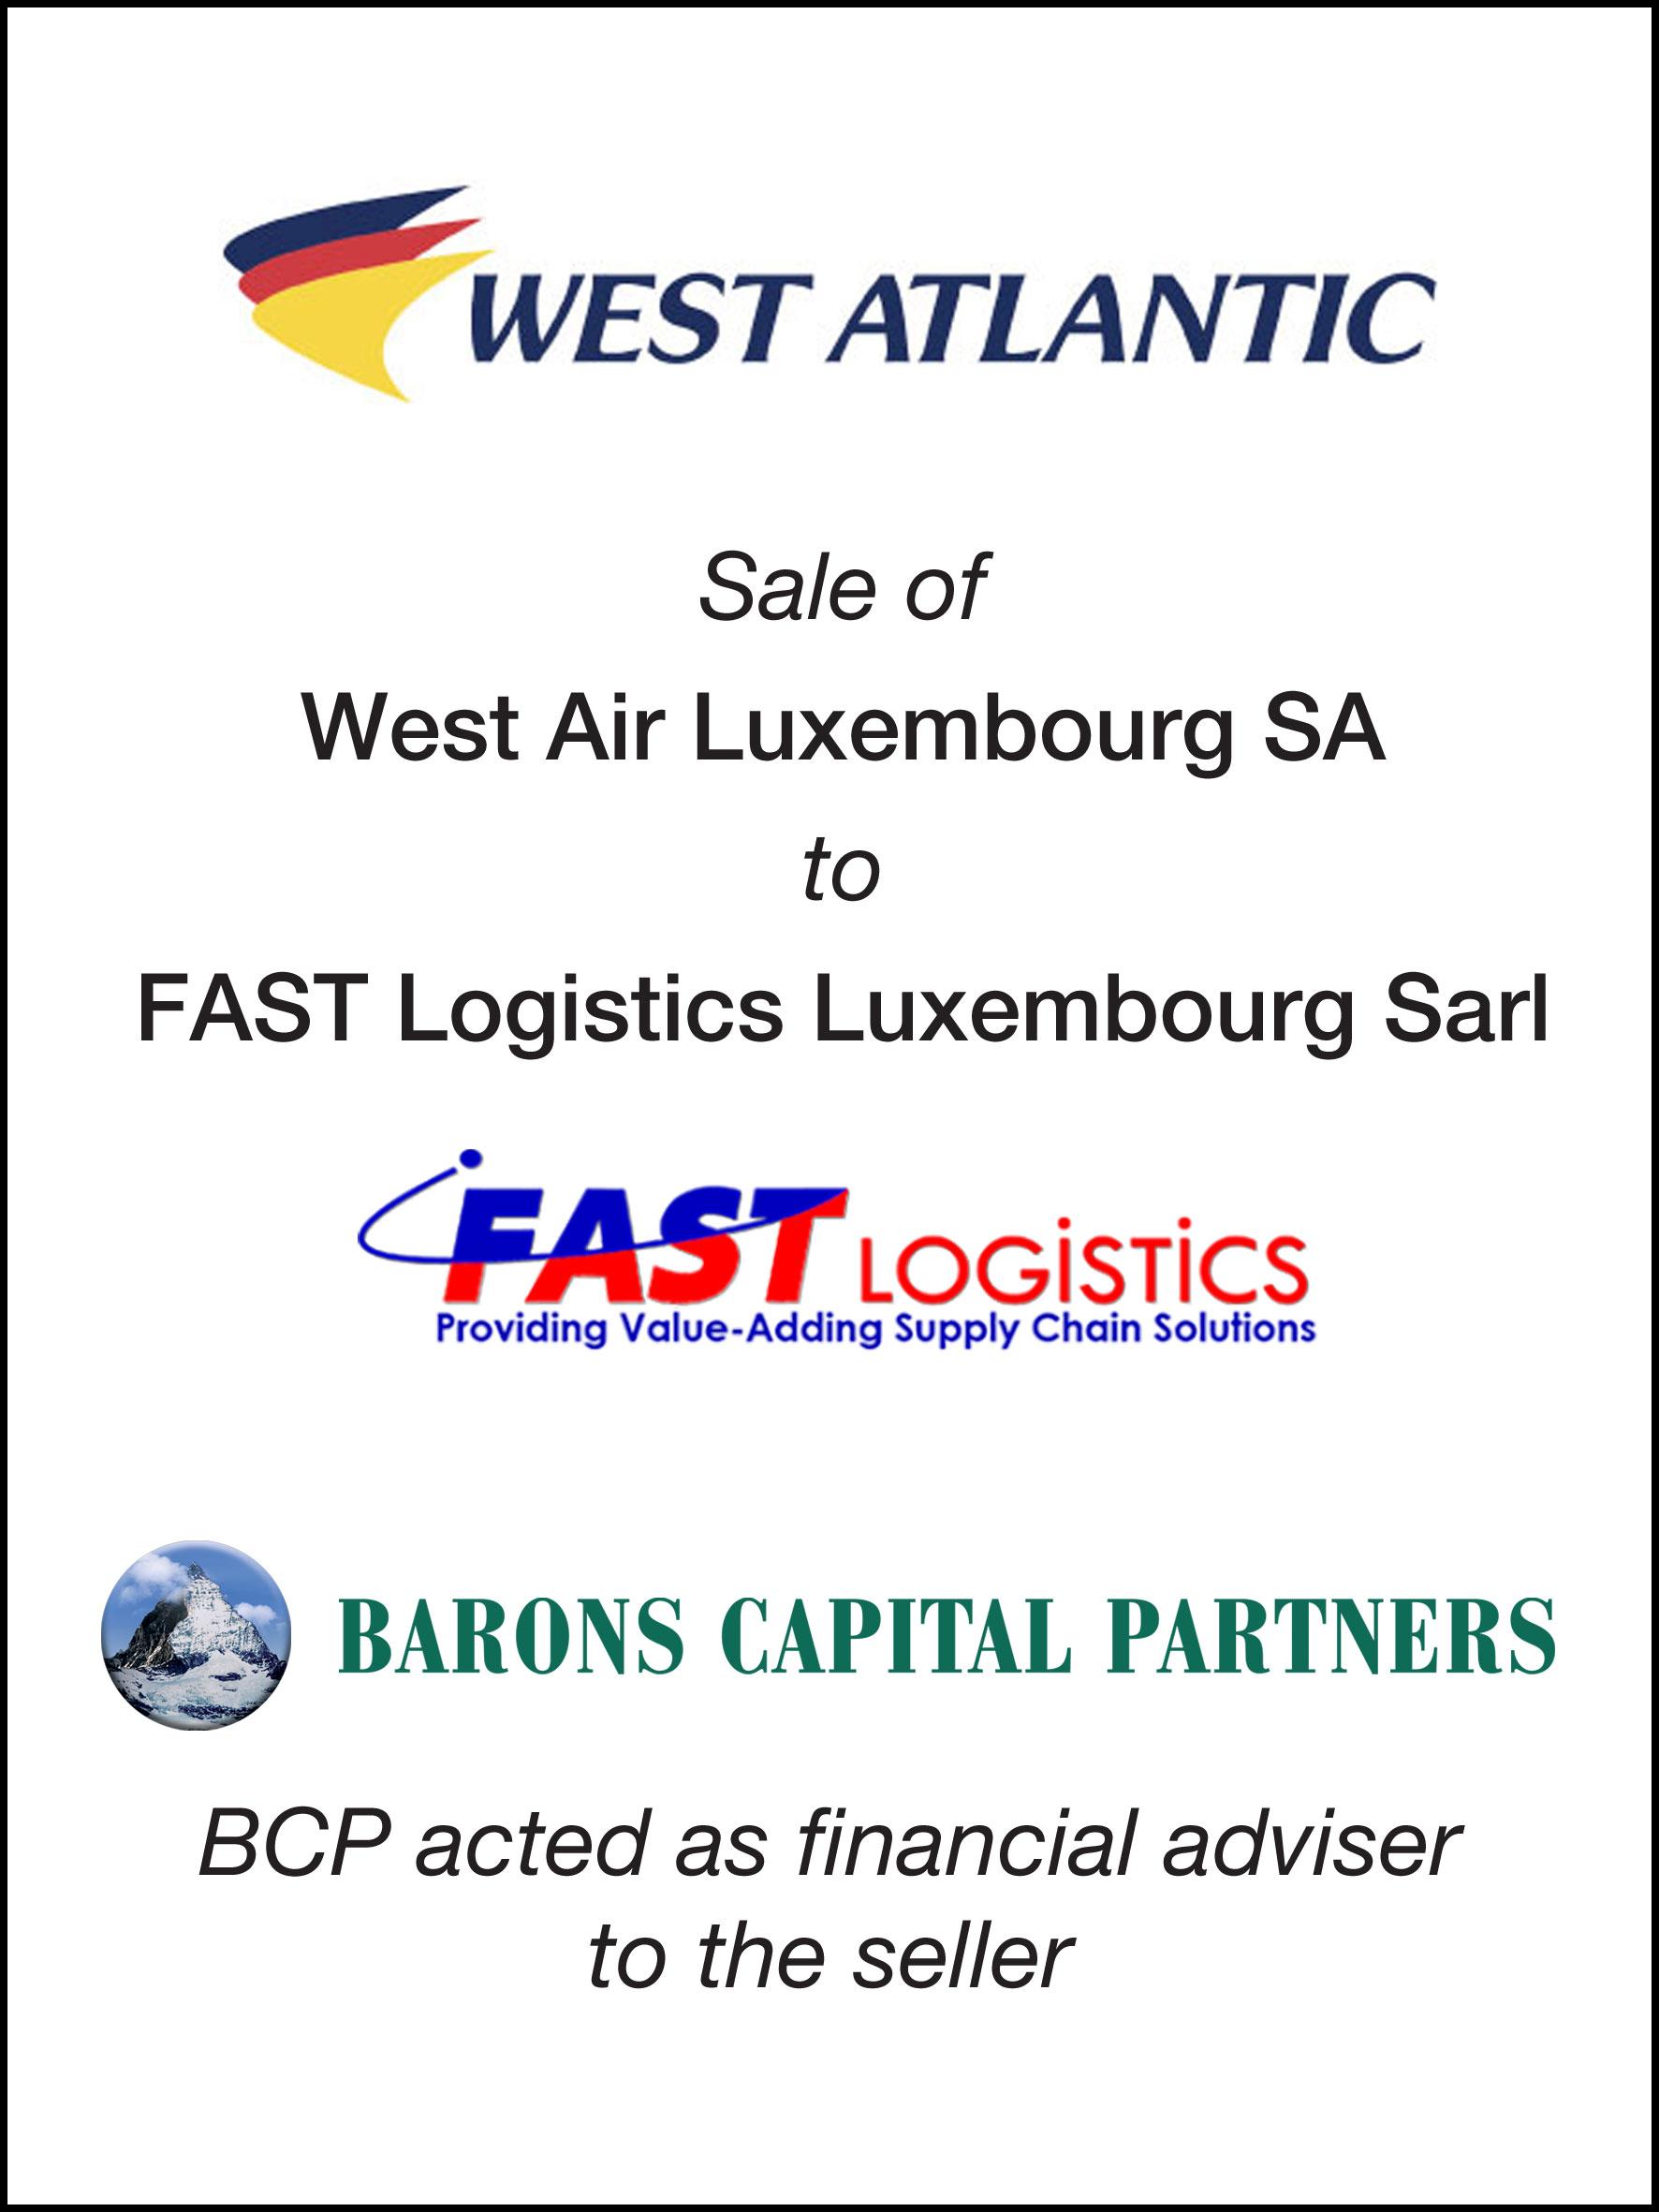 8_West Atlantic